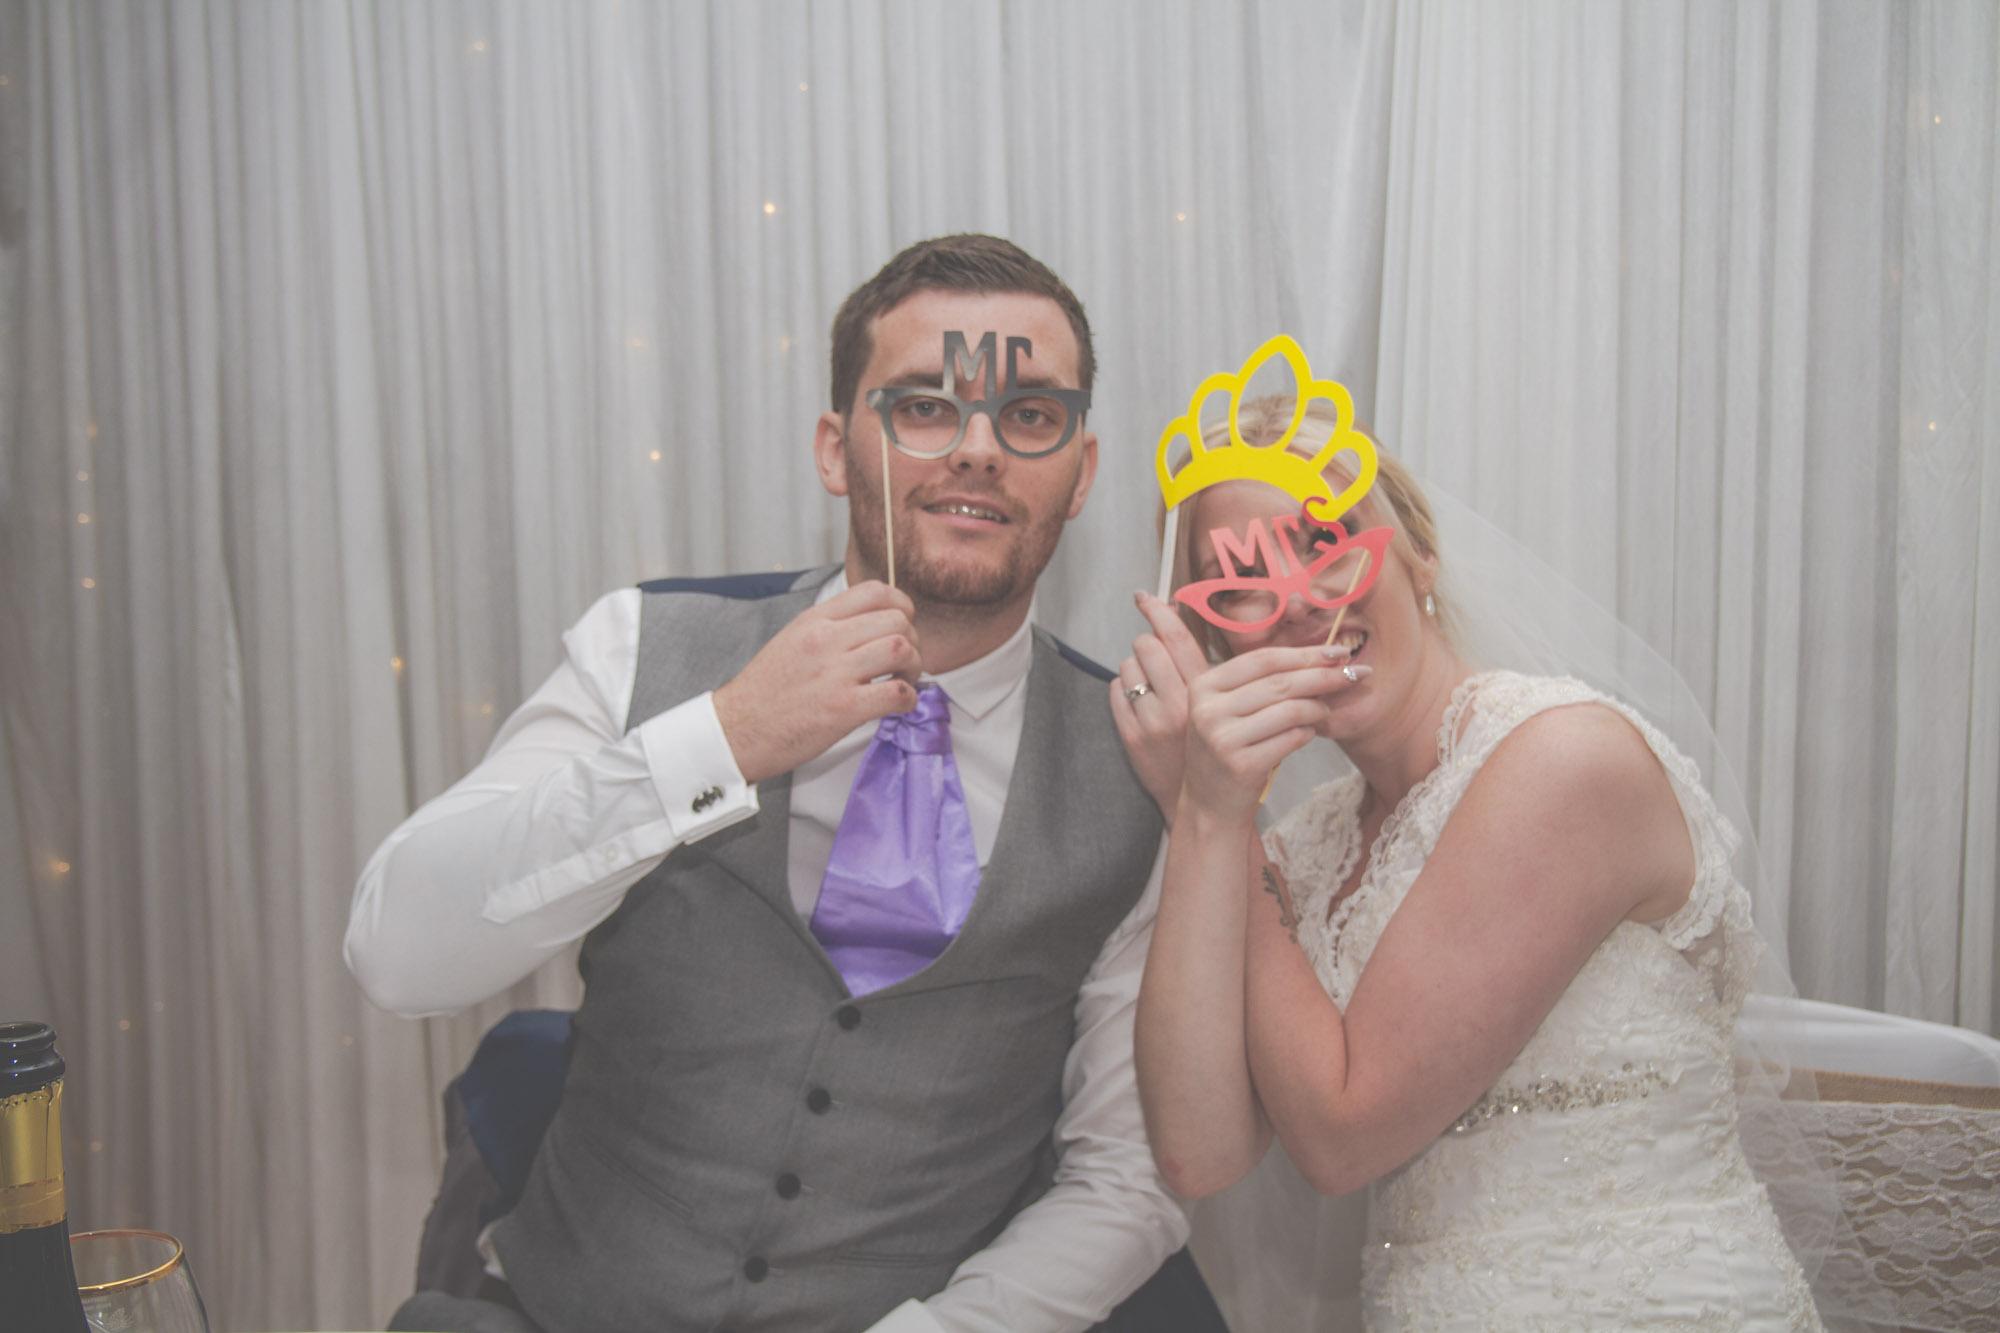 skipton-registry-office-wedding-photography-57.jpg